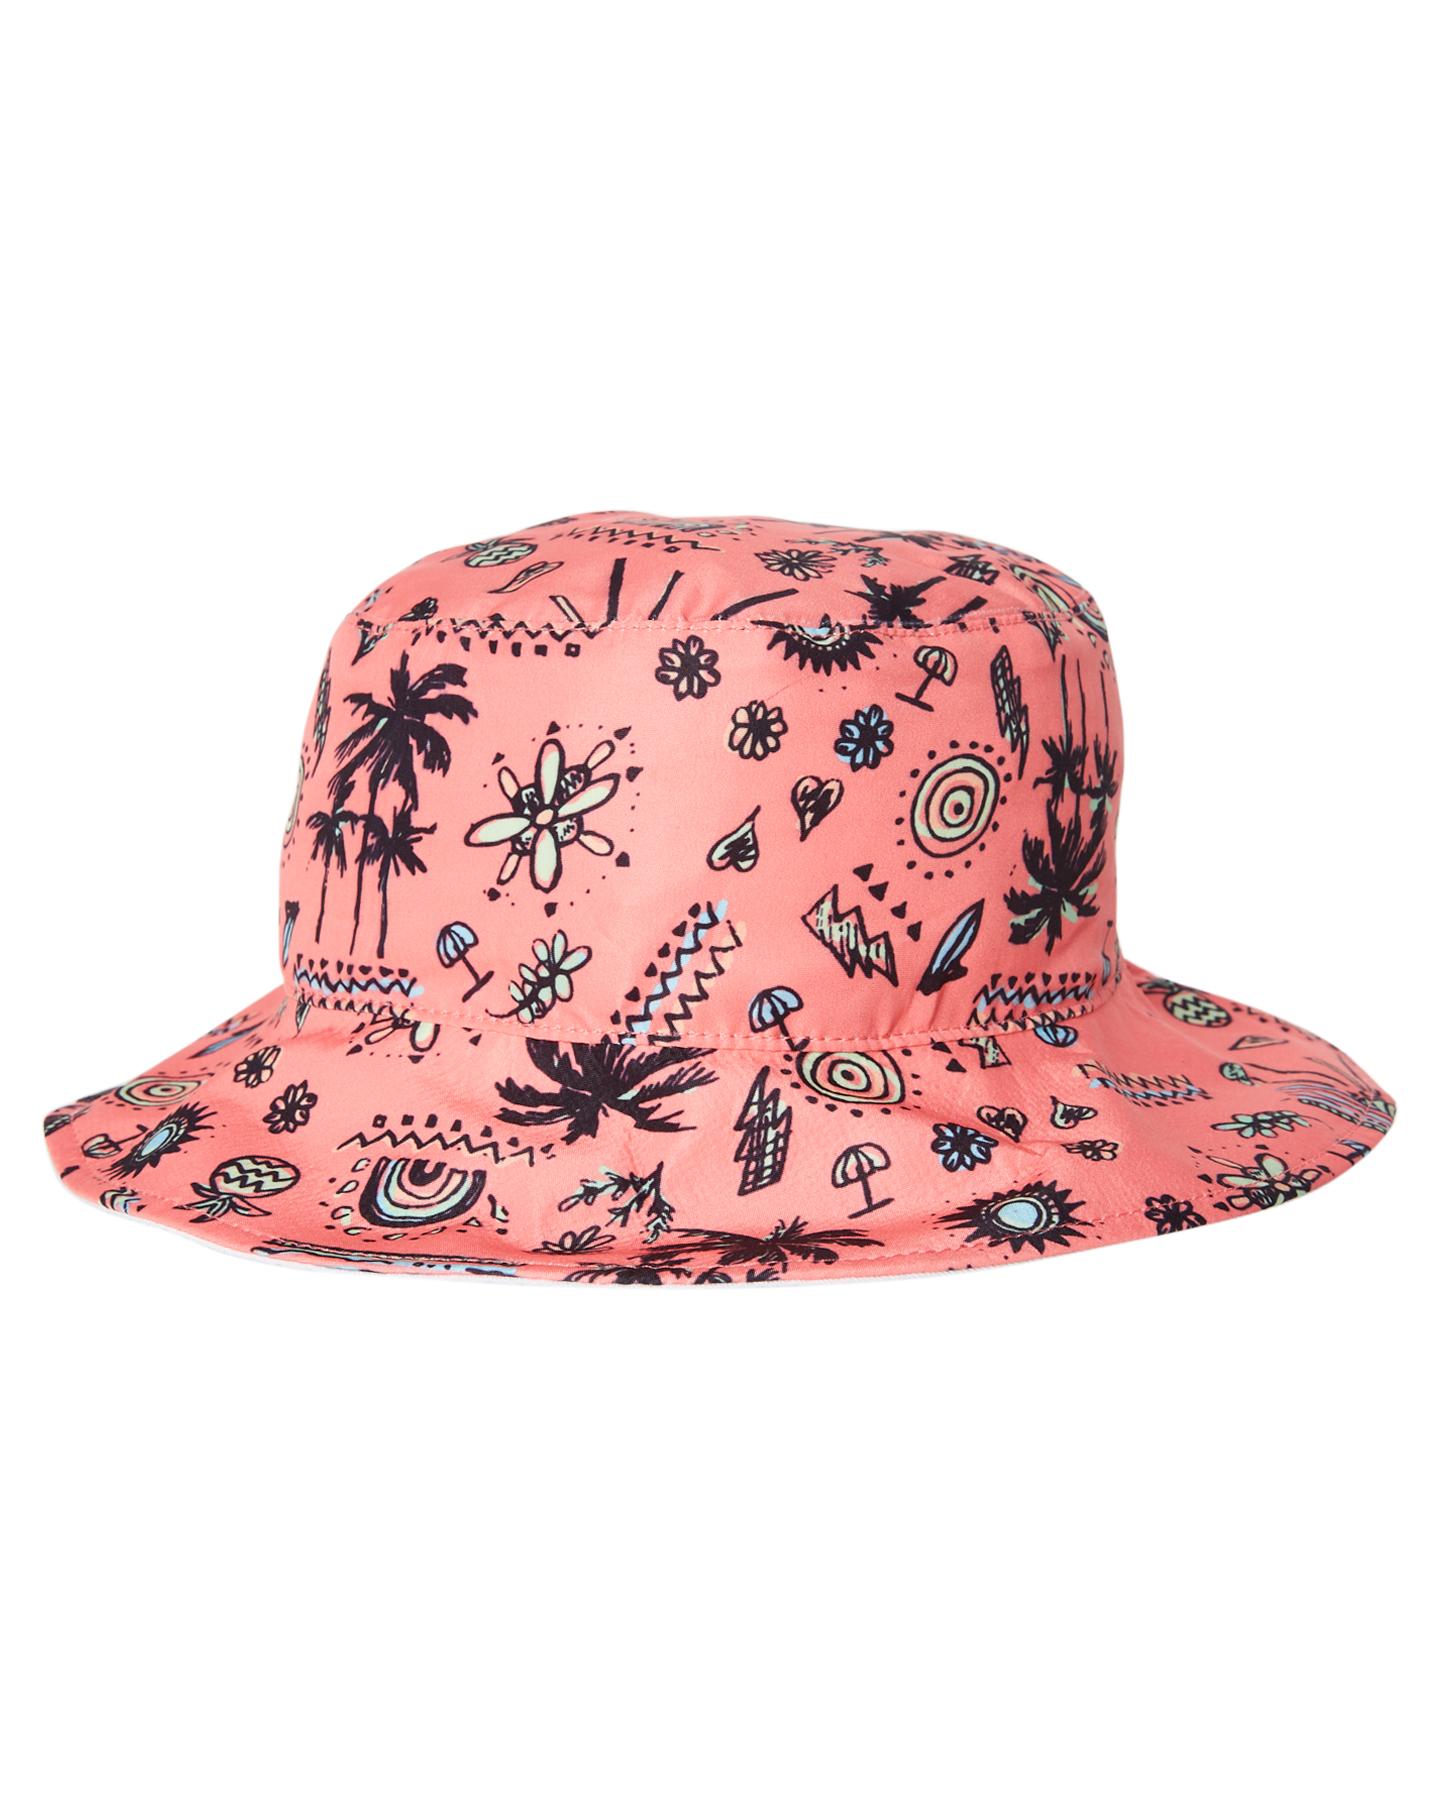 bdffbefc Rip Curl Tots Girls Anak Bucket Hat Coral Coral Accessories Size ...